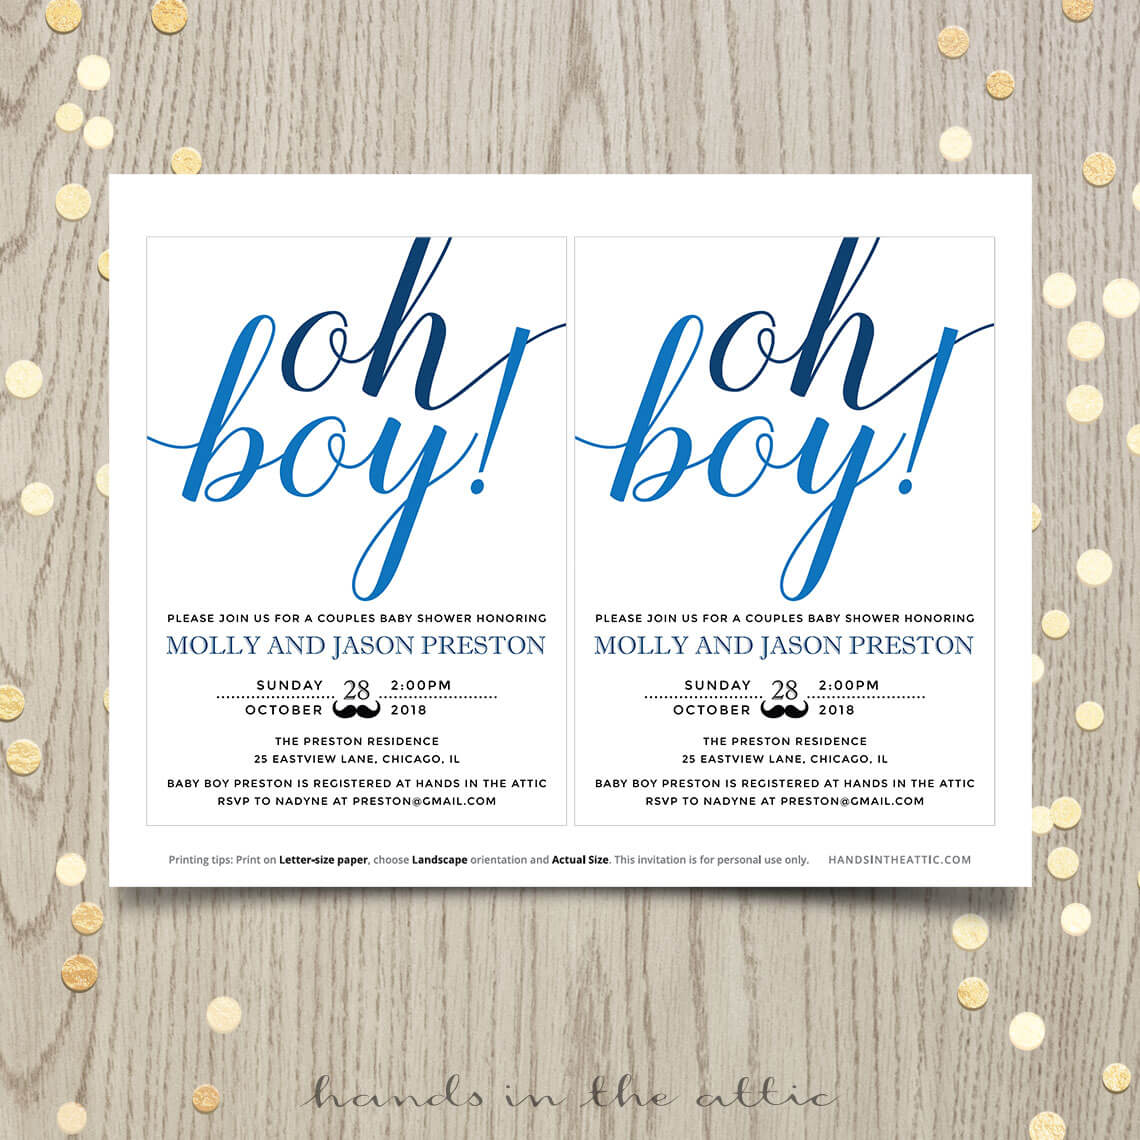 Order Custom Wedding Invitations Online